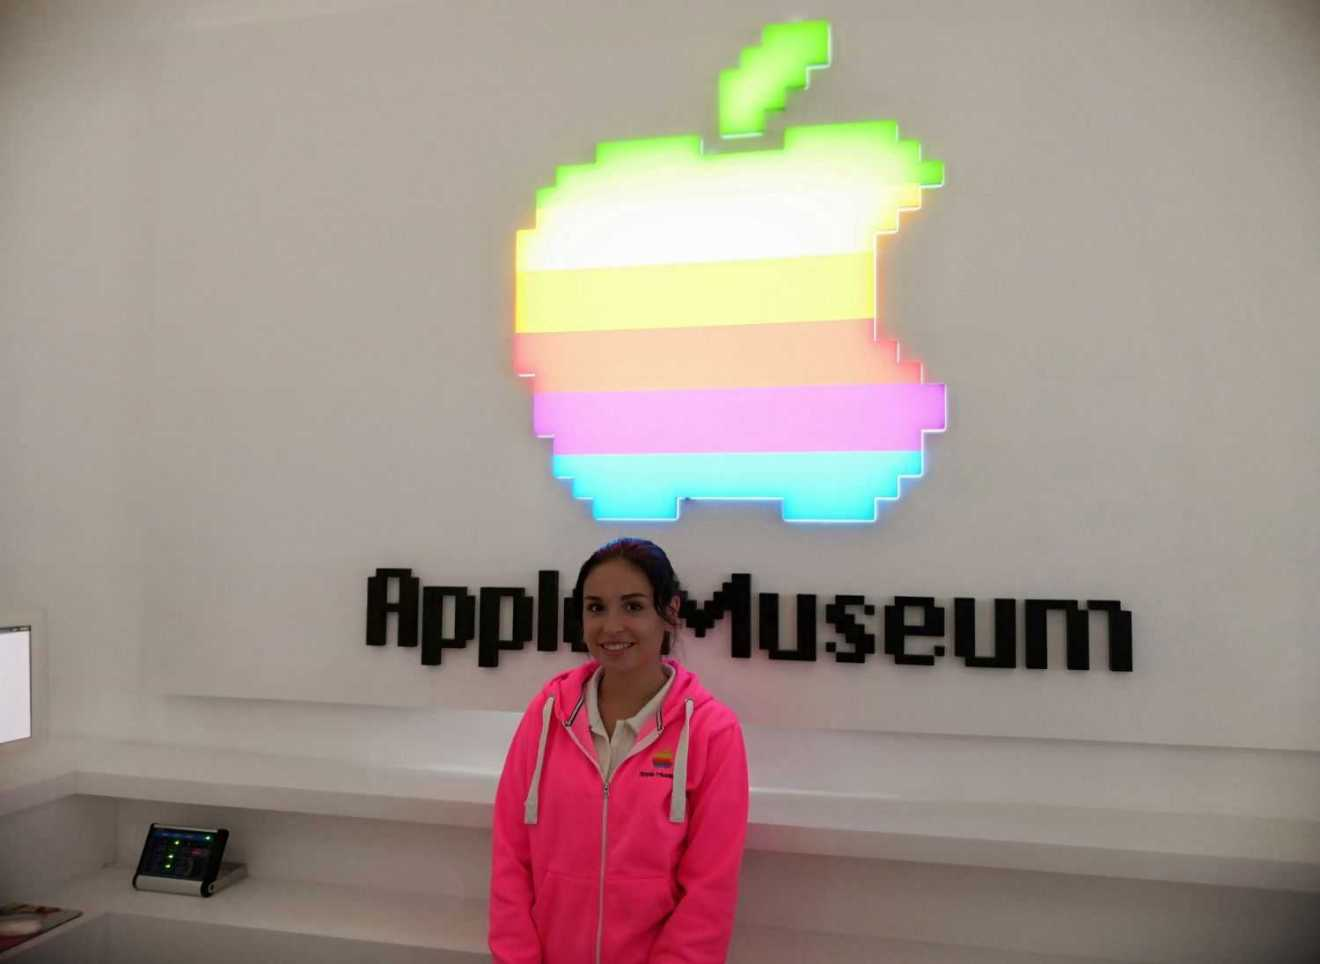 Apple Museum Prague 1 - Posjetili smo Apple Museum u Pragu i vidjeli prototip prvog iPhone mobitela